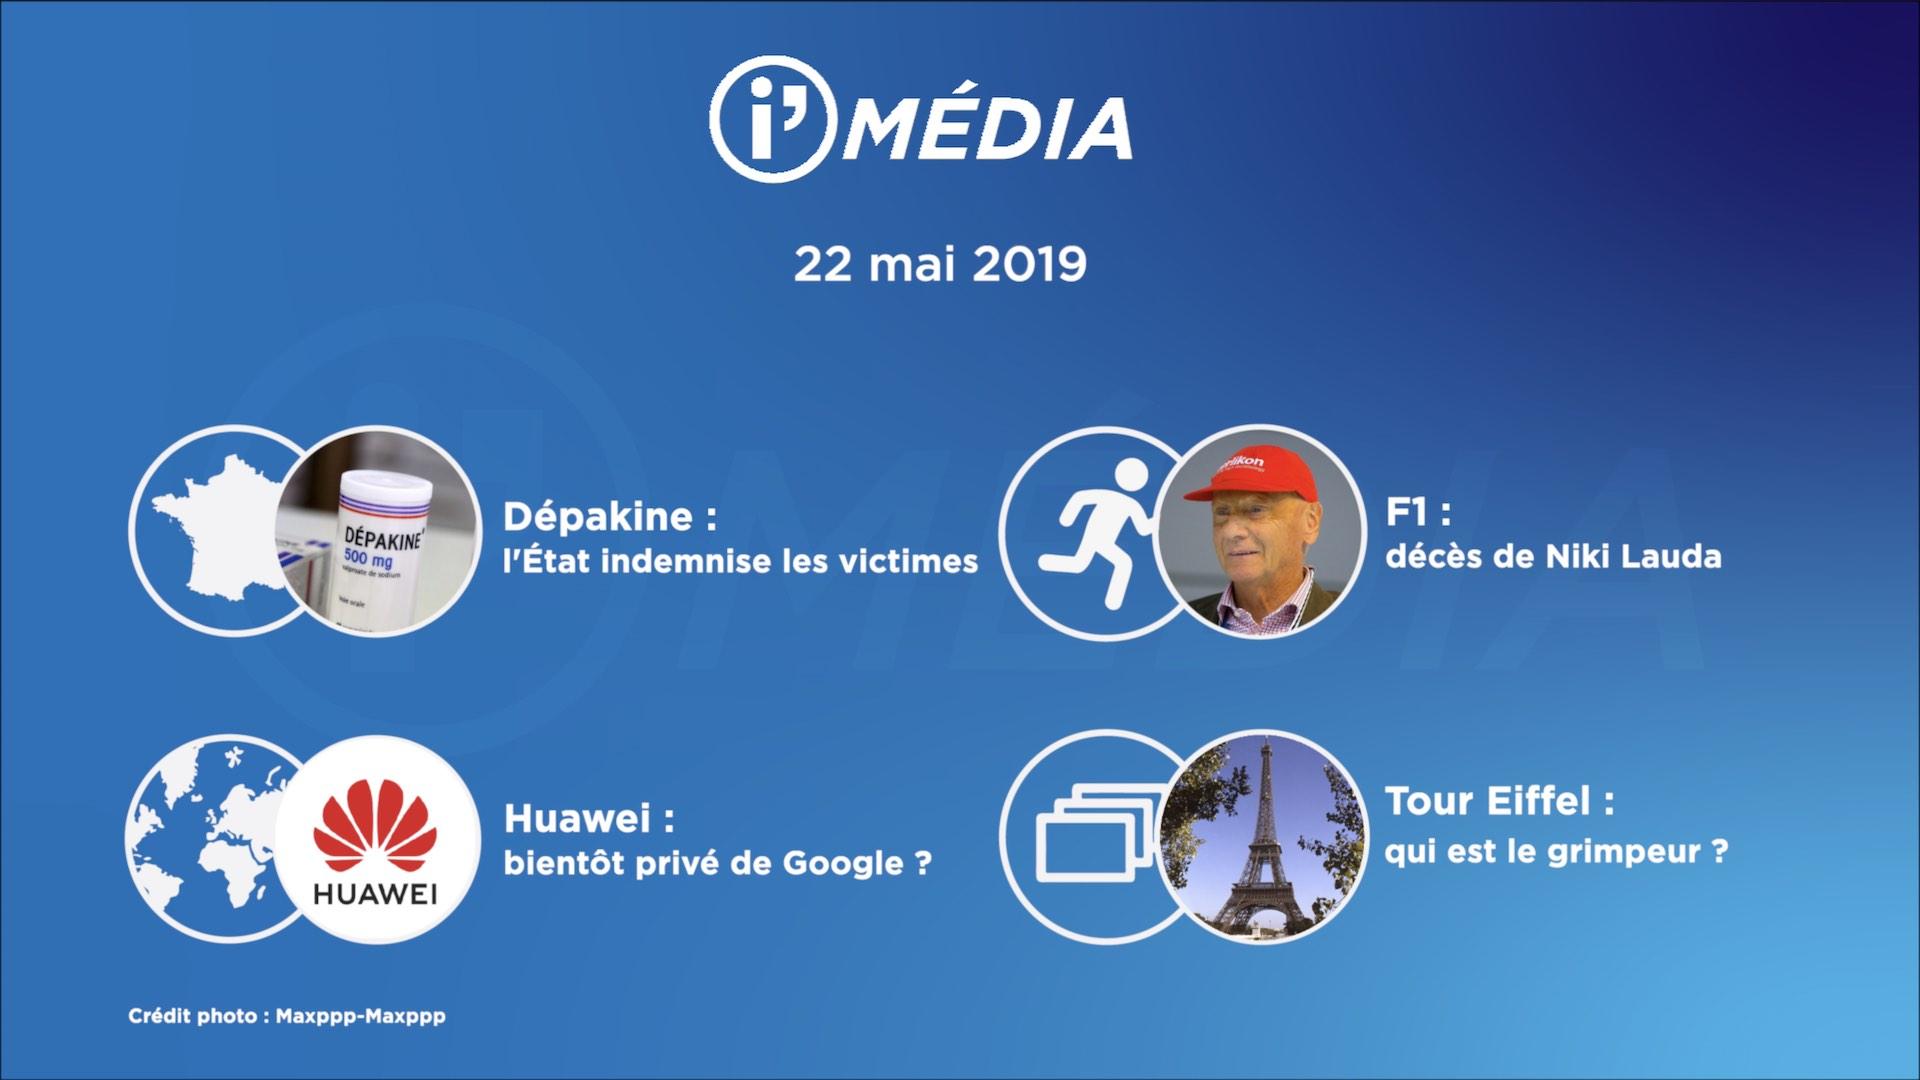 I'Média 22 mai 2019